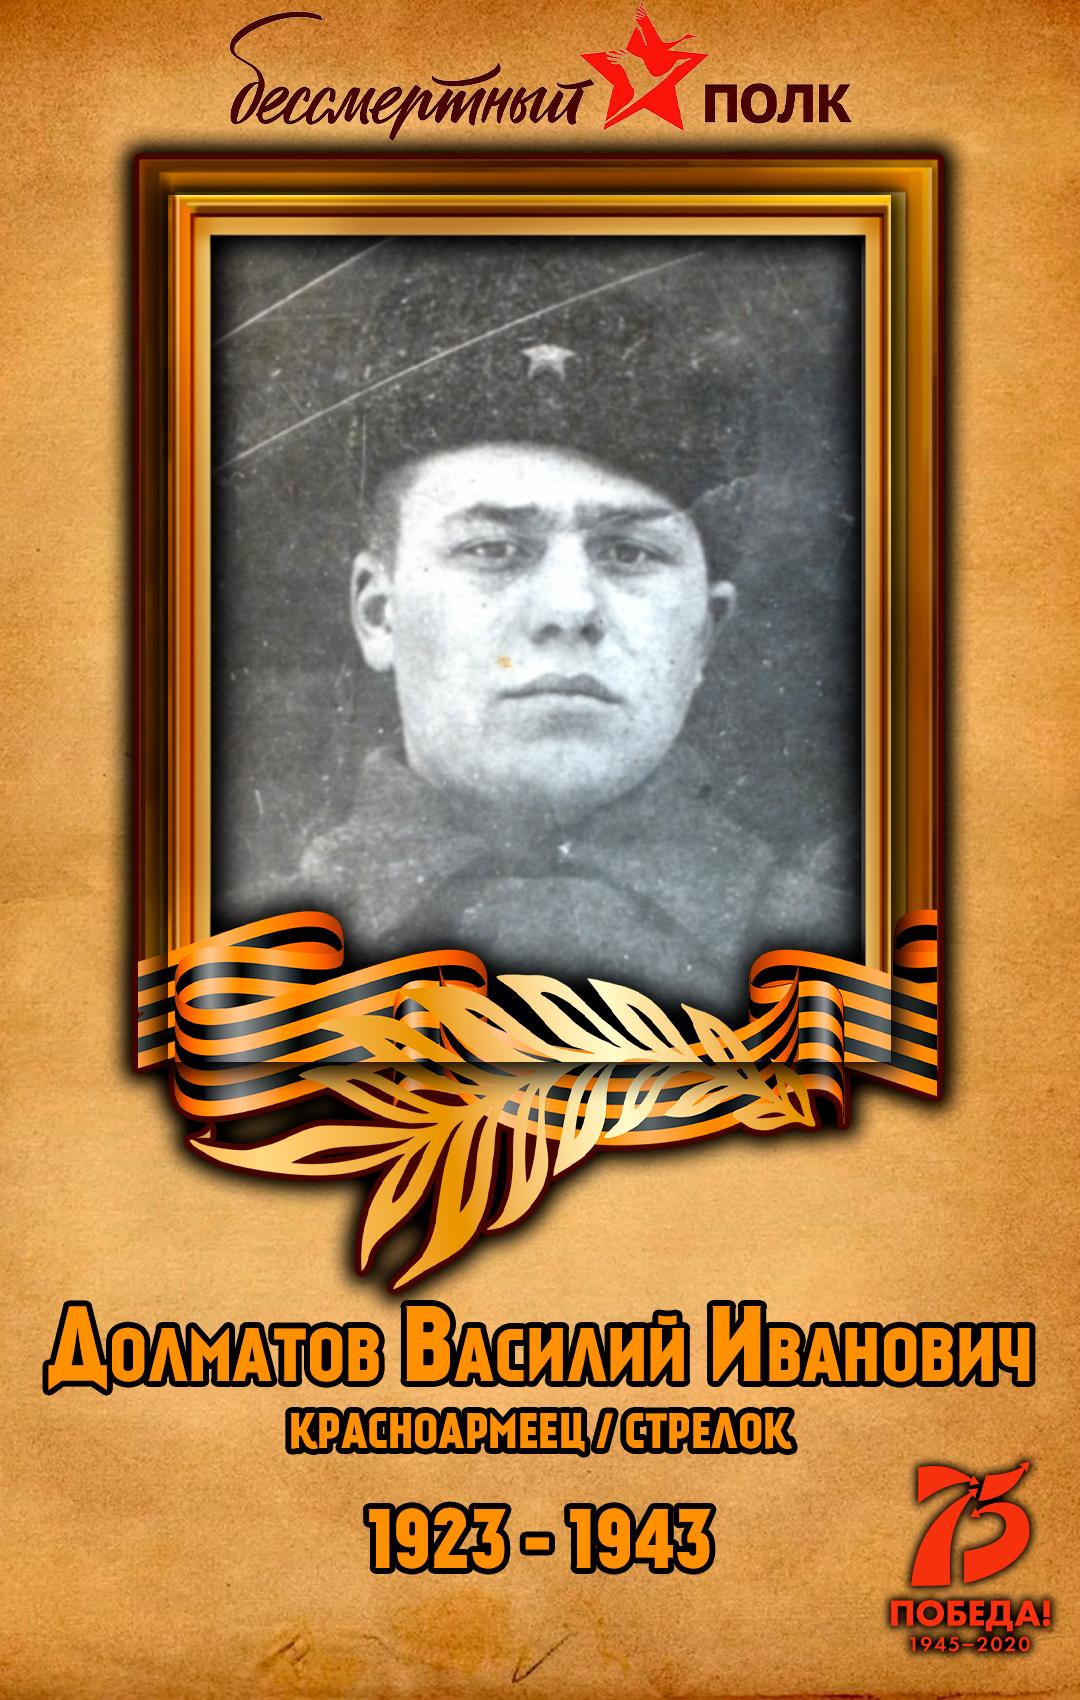 Долматов-Василий-Иванович